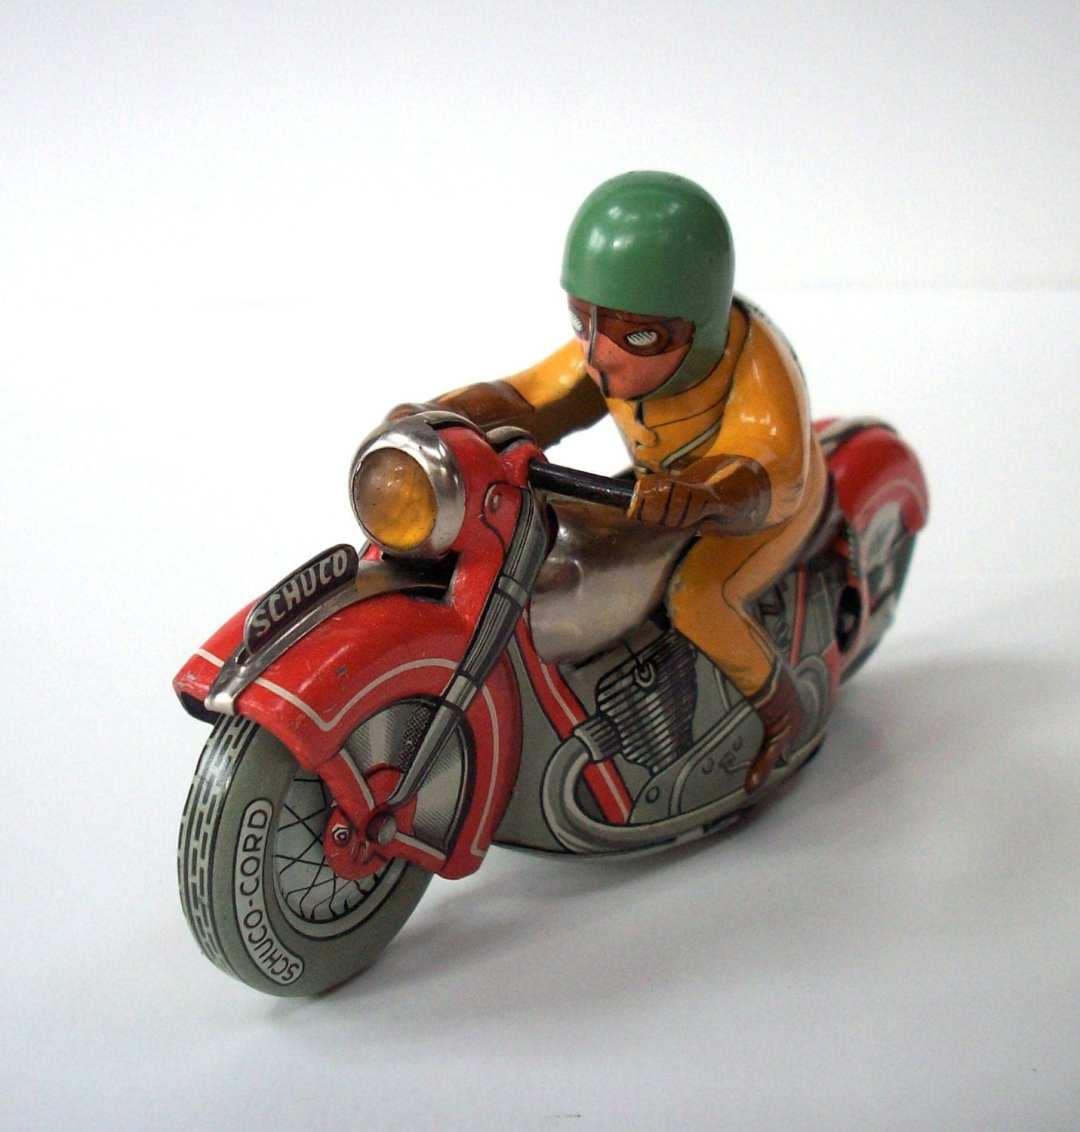 Schuco Motodrill 1006